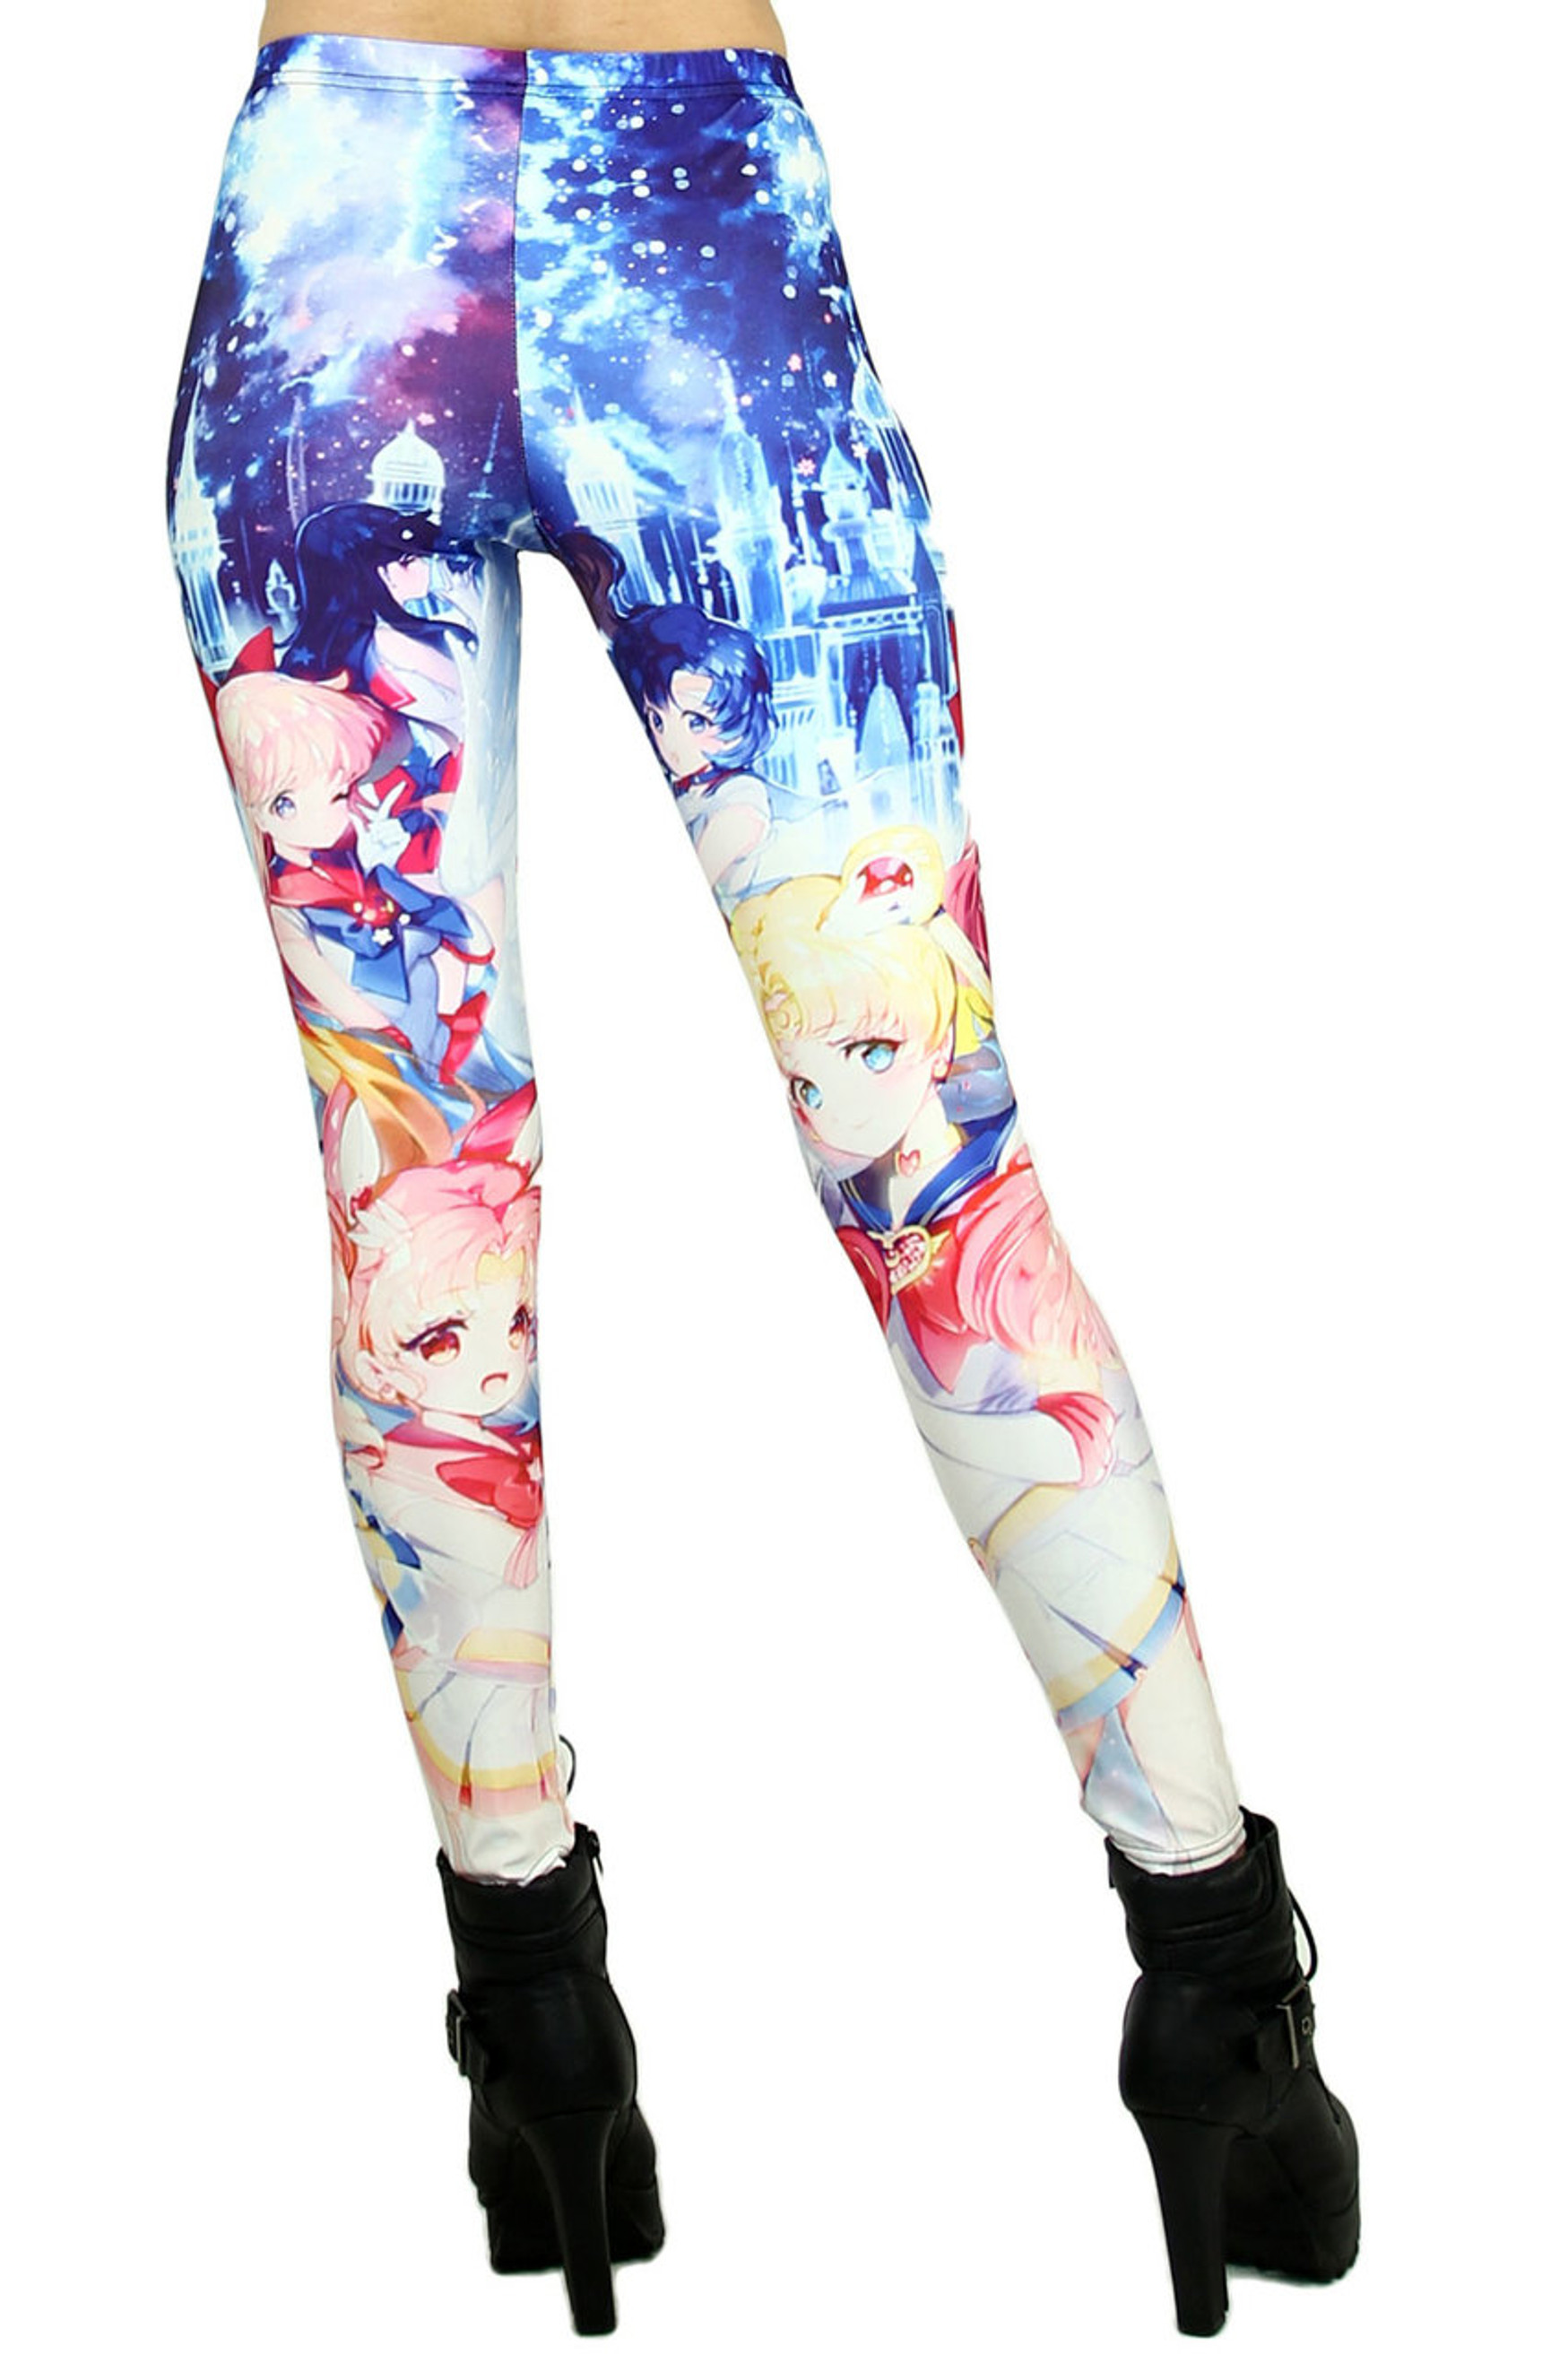 Sailor Moon and Friends Leggings